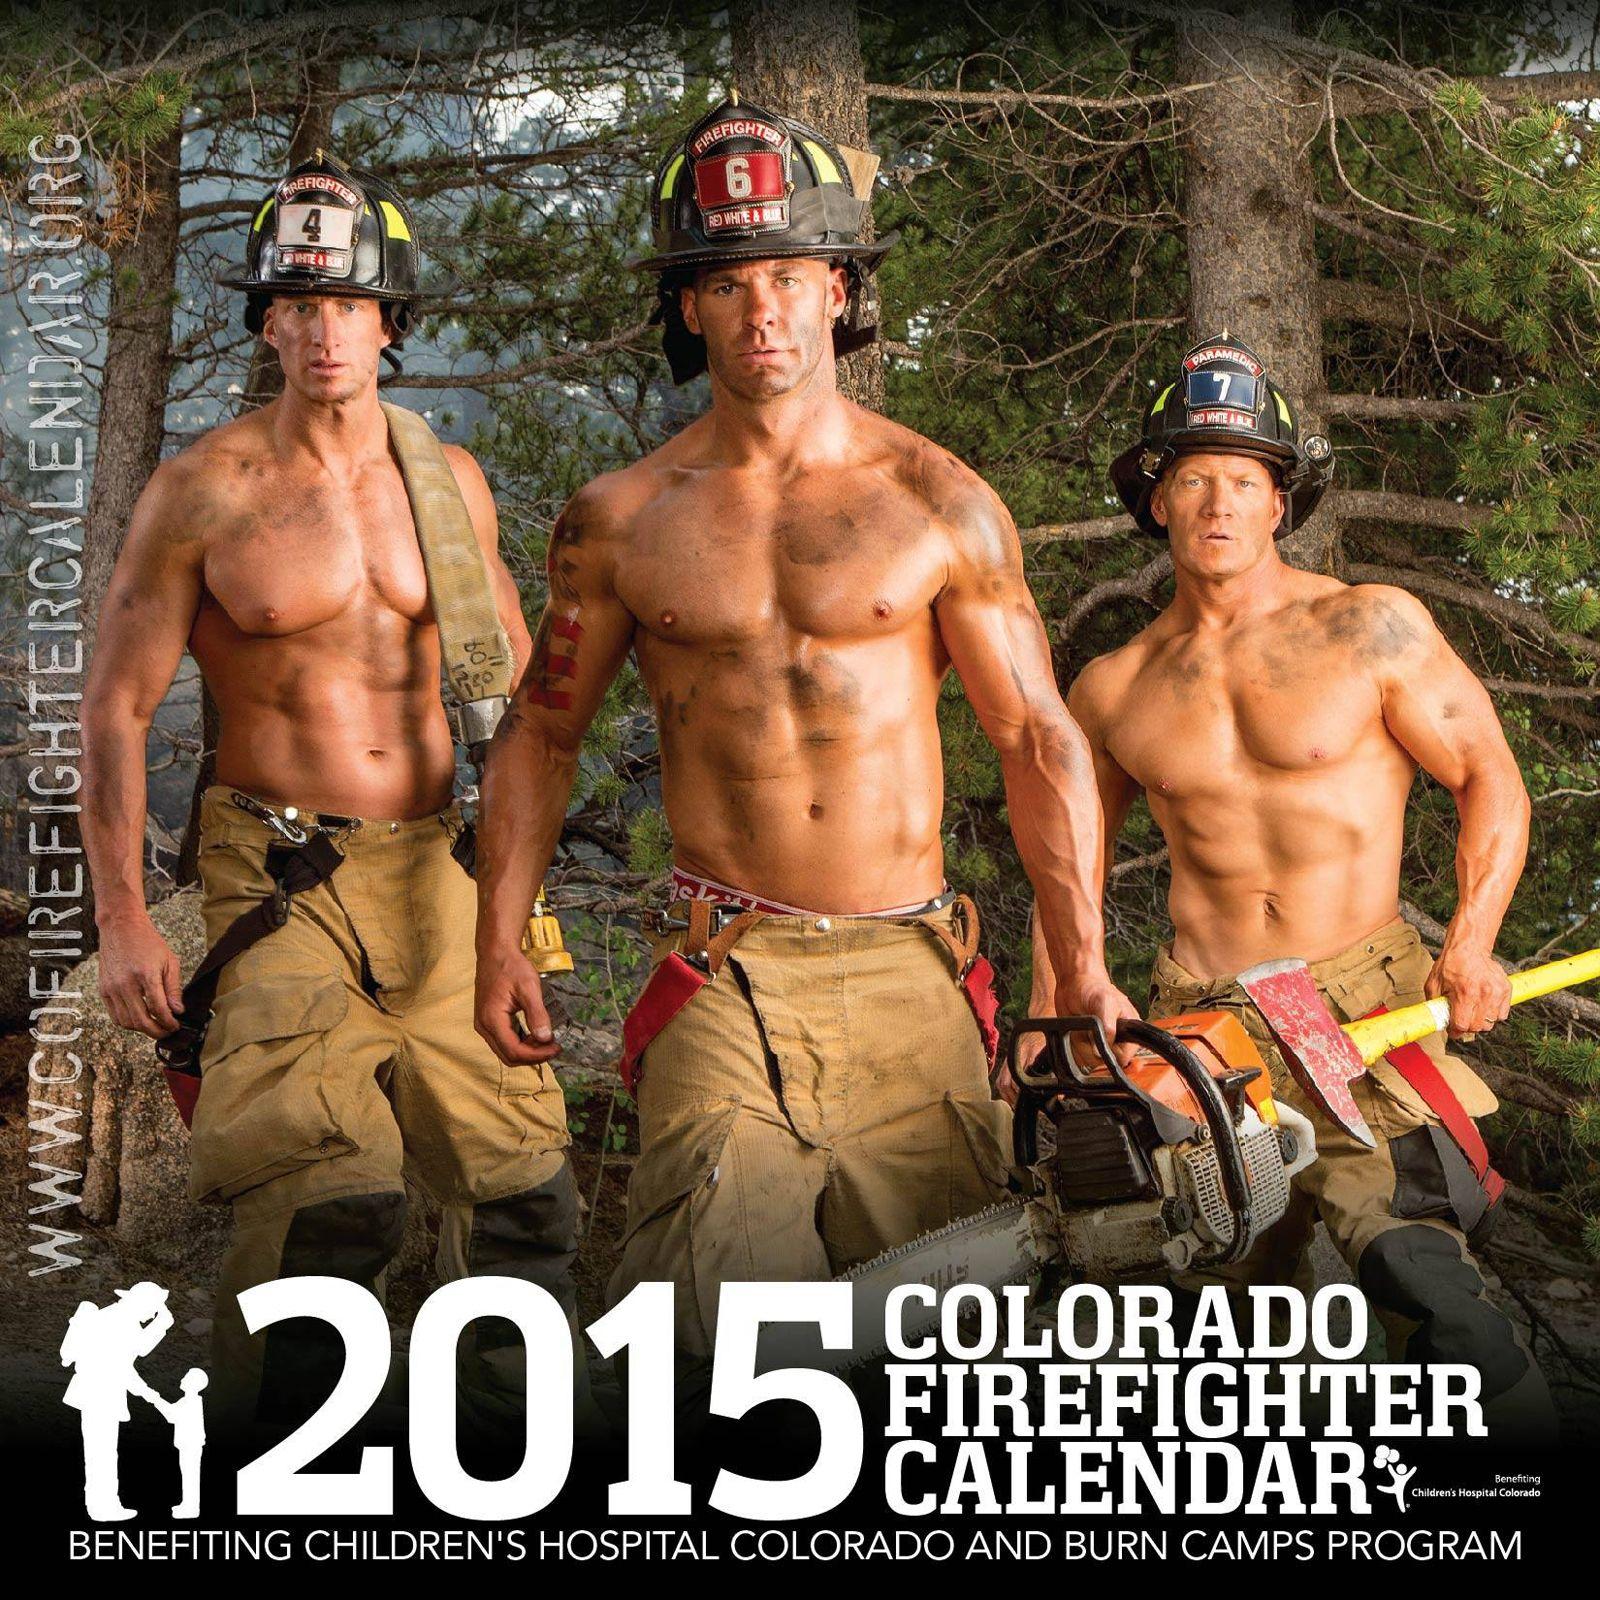 2015 Colorado Firefighters Calendar Hot Firemen Always Make For A